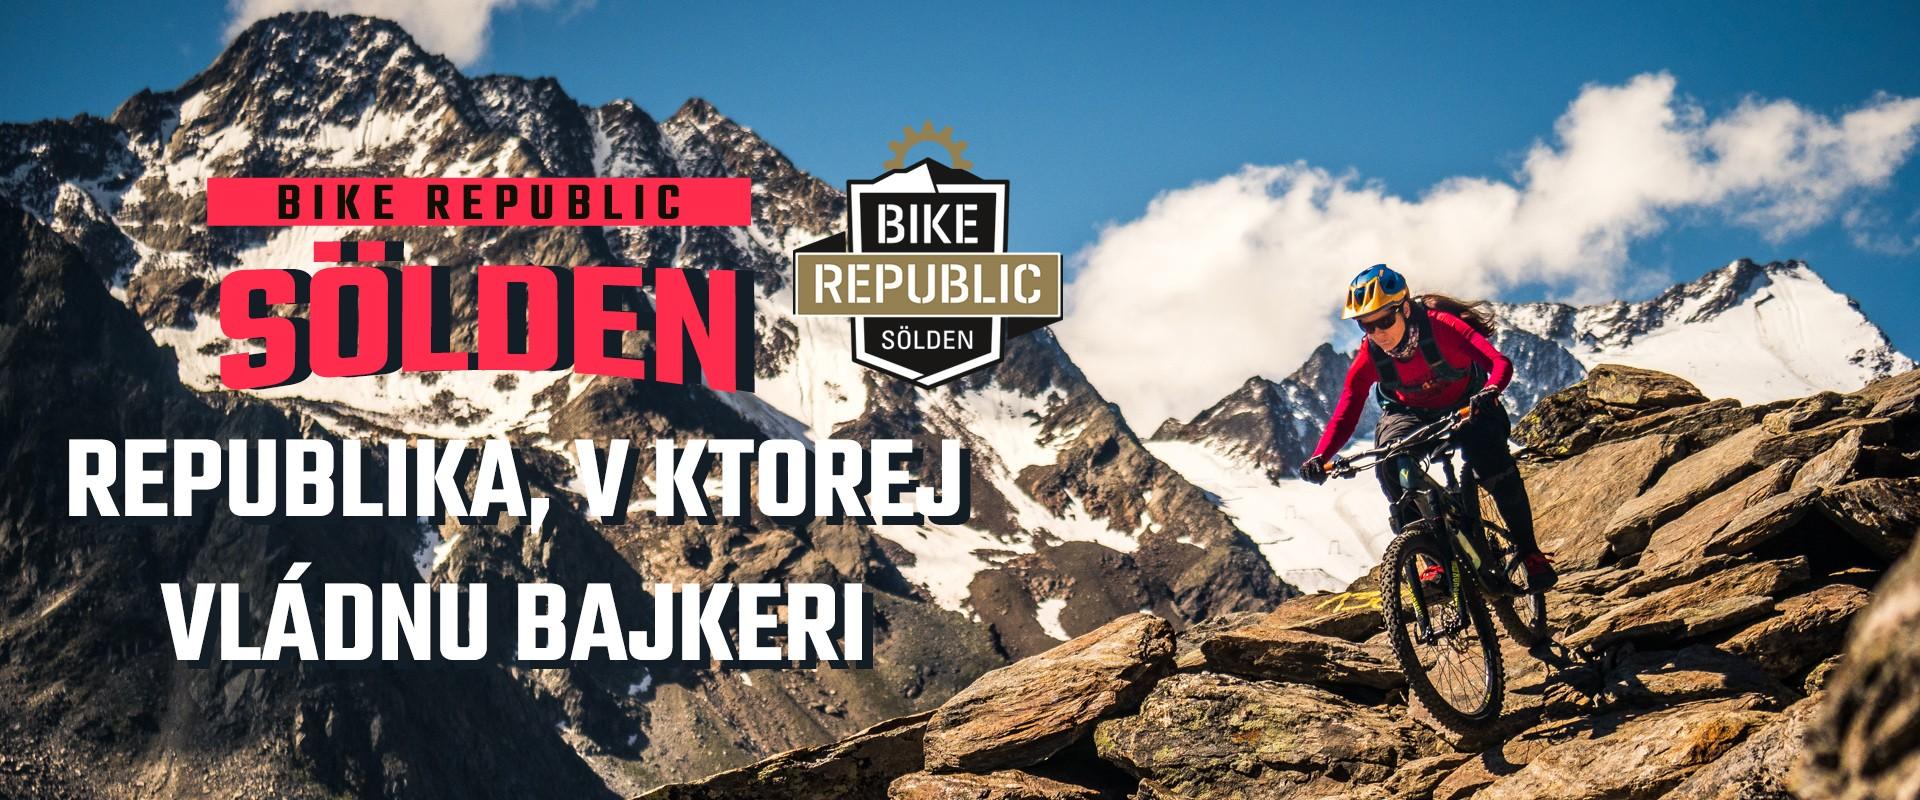 Bike Republic Sölden - republika, v ktorej vládnu bajkeri